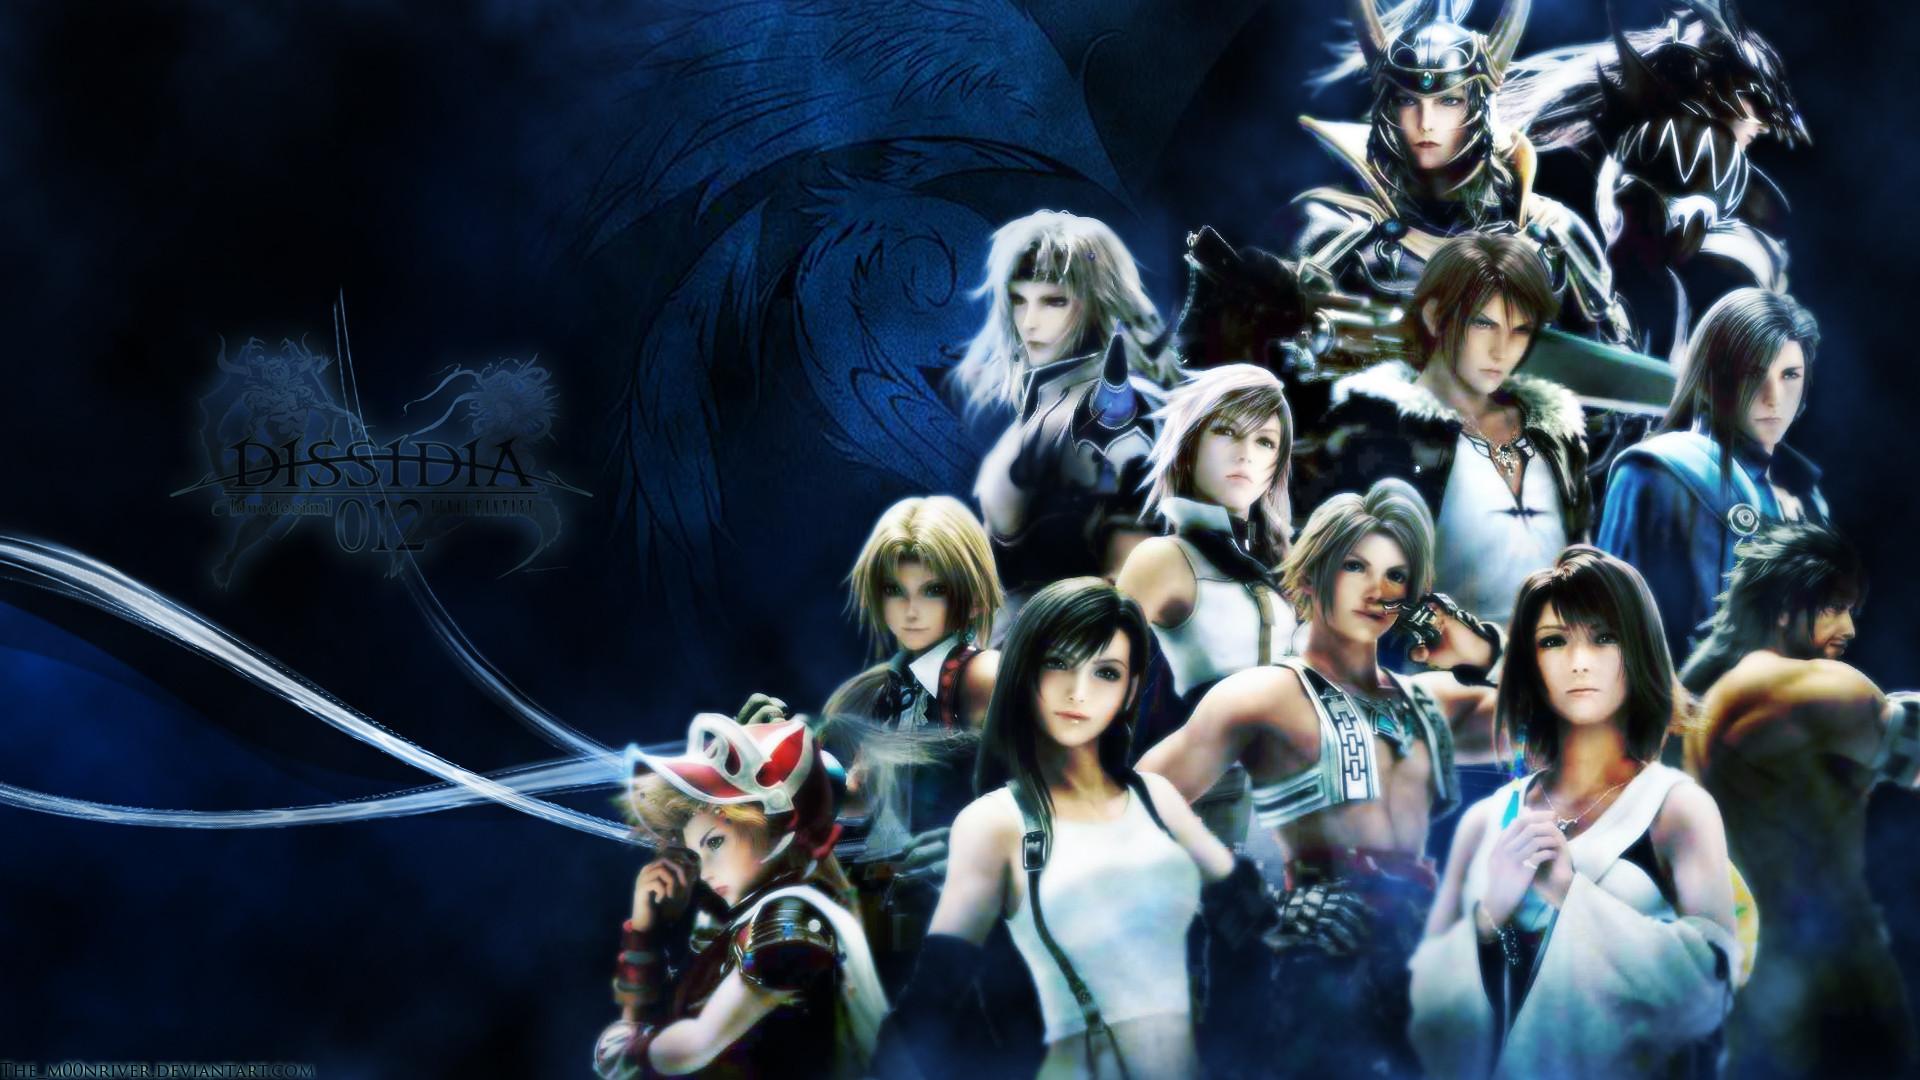 Final Fantasy Series · download Final Fantasy Series image